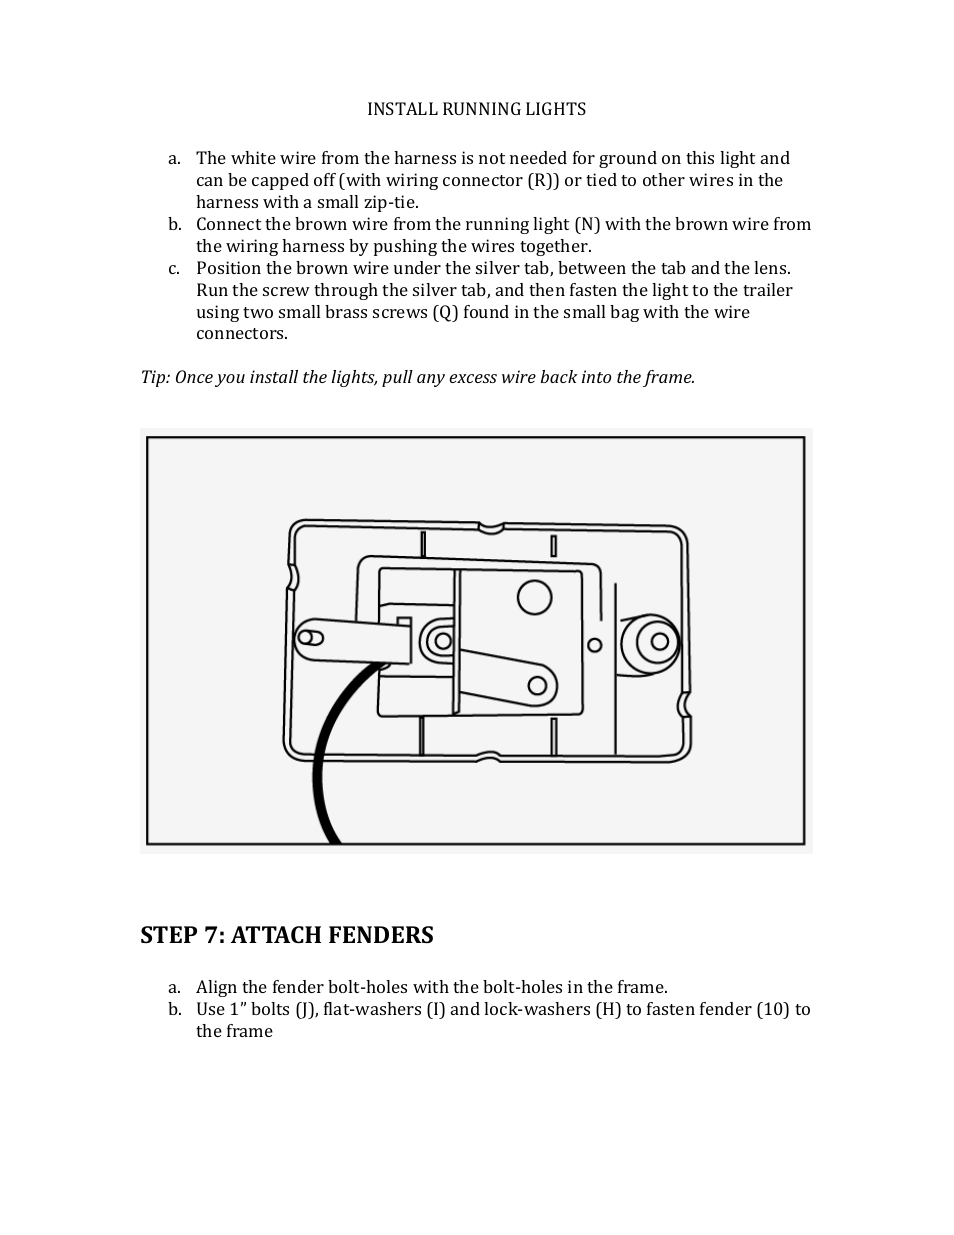 Step 7: attach fenders | Northstar Trailers SPORTSTAR I User Manual ...